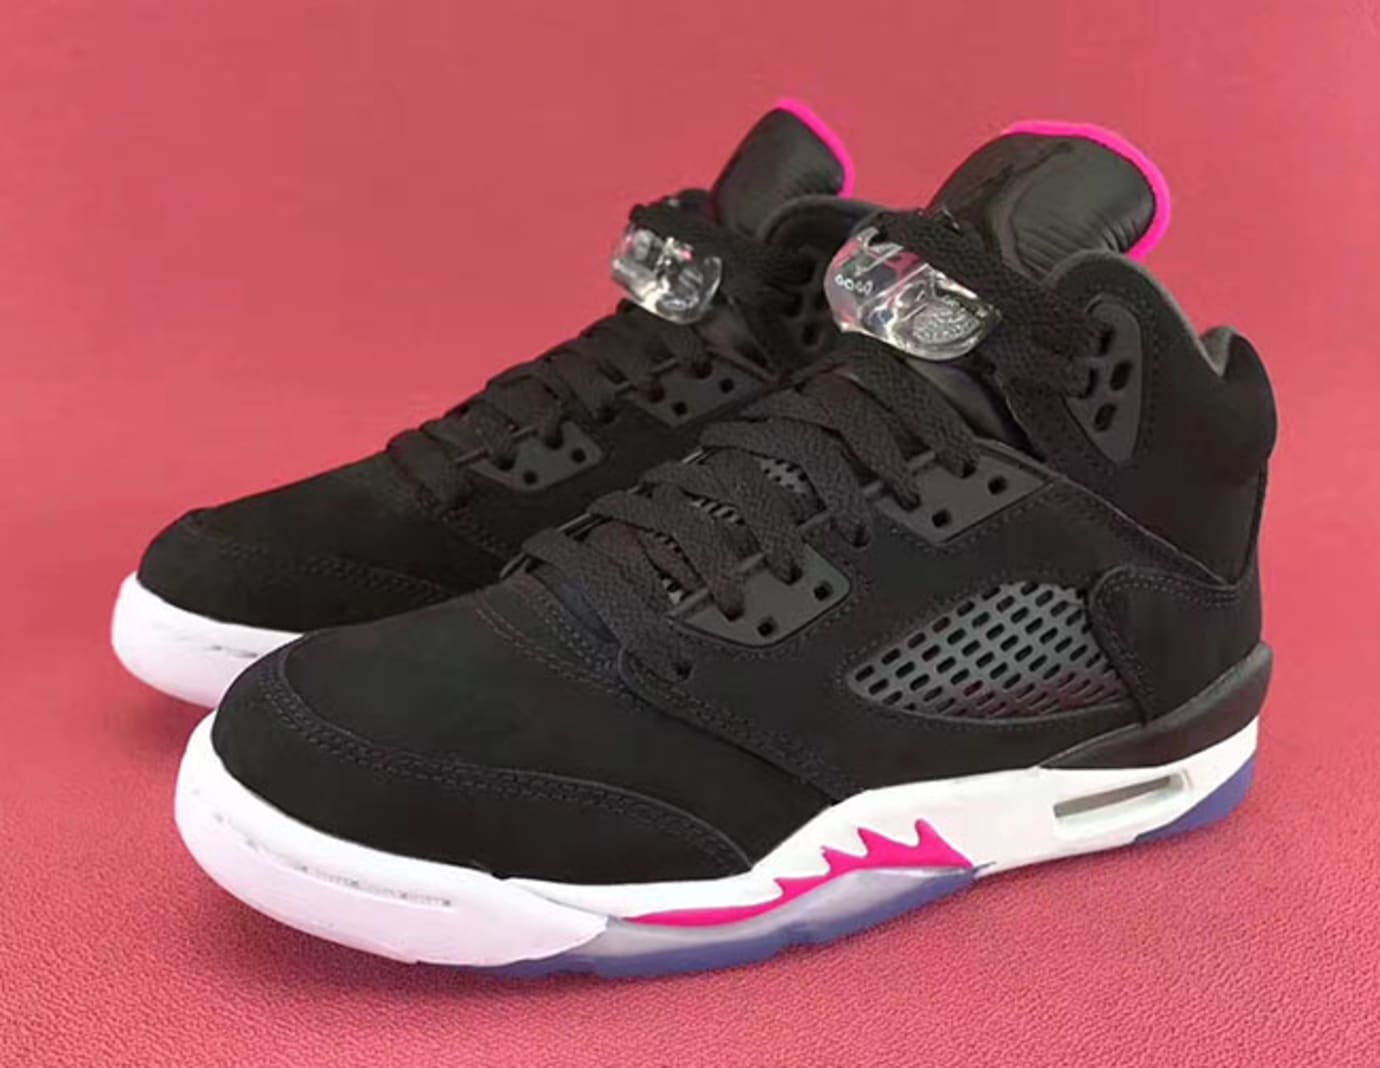 Air Jordan 5 GS Deadly Pink Release Date Left 440892-029